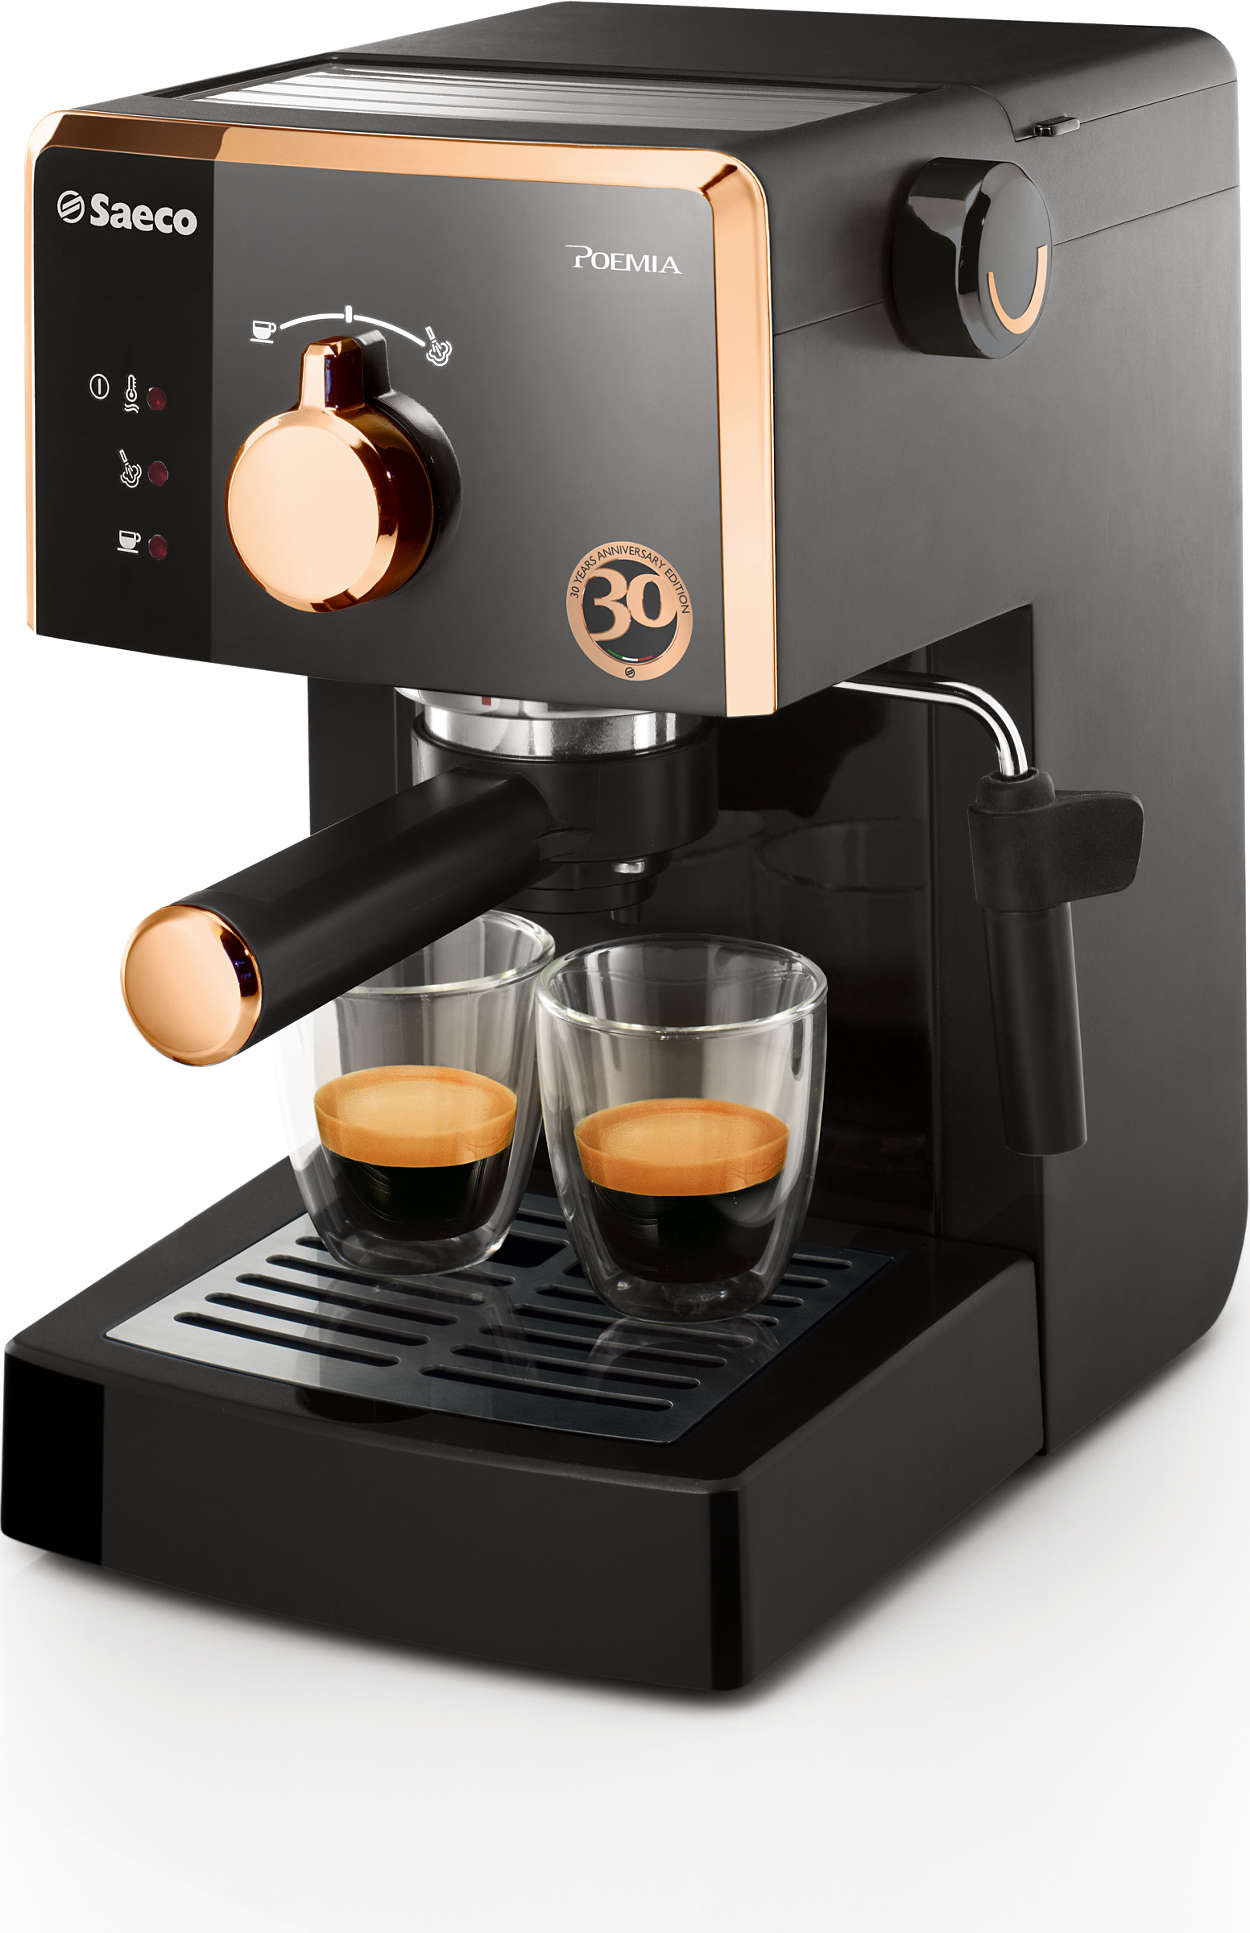 Autentisk italiensk espresso hver dag